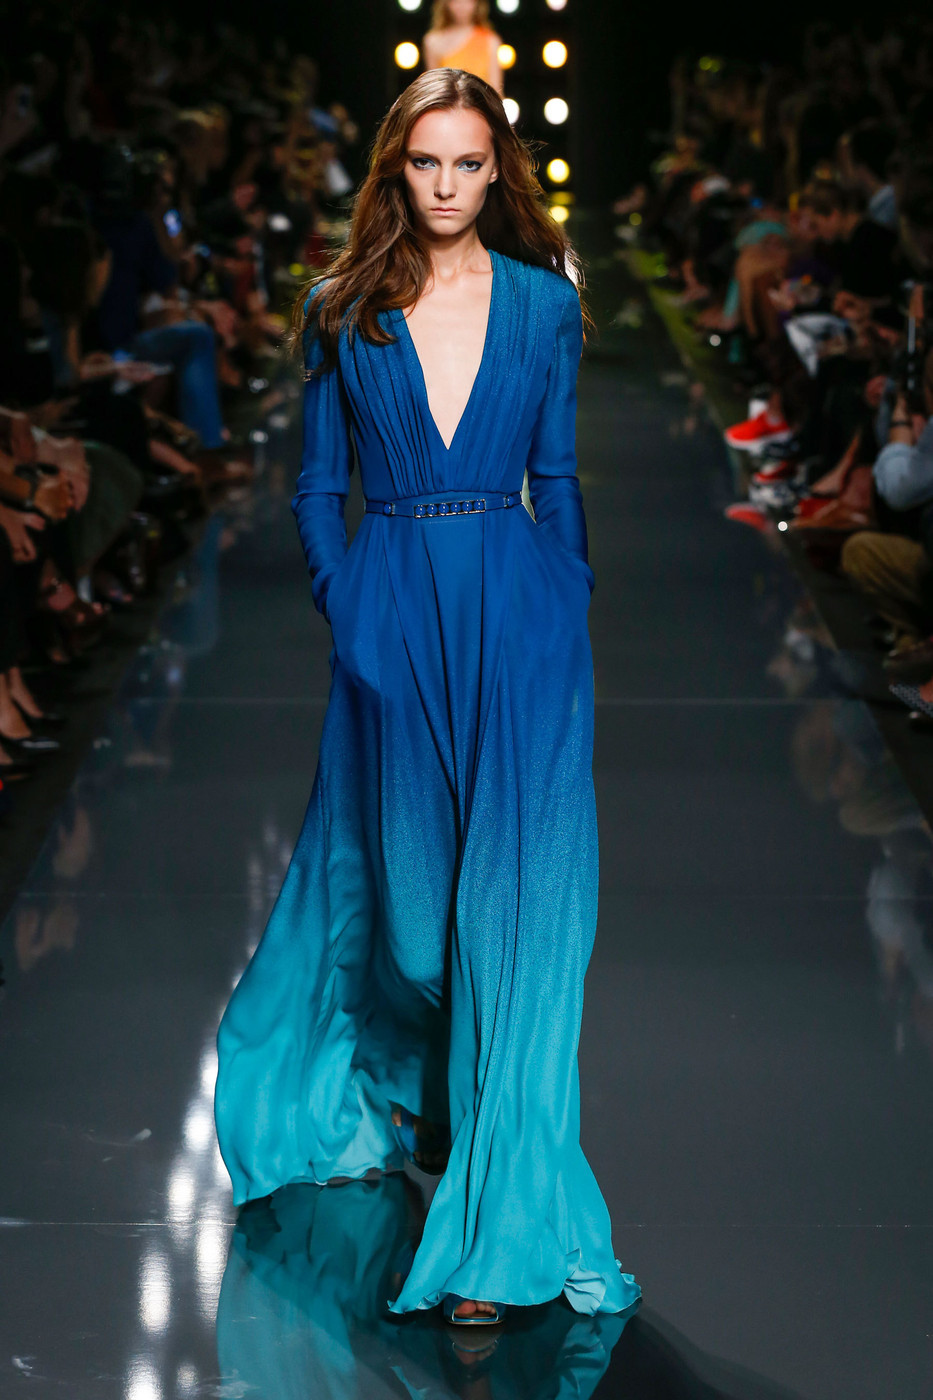 Long Sleeve Evening Dresses Elie Saab – Fashion dresses